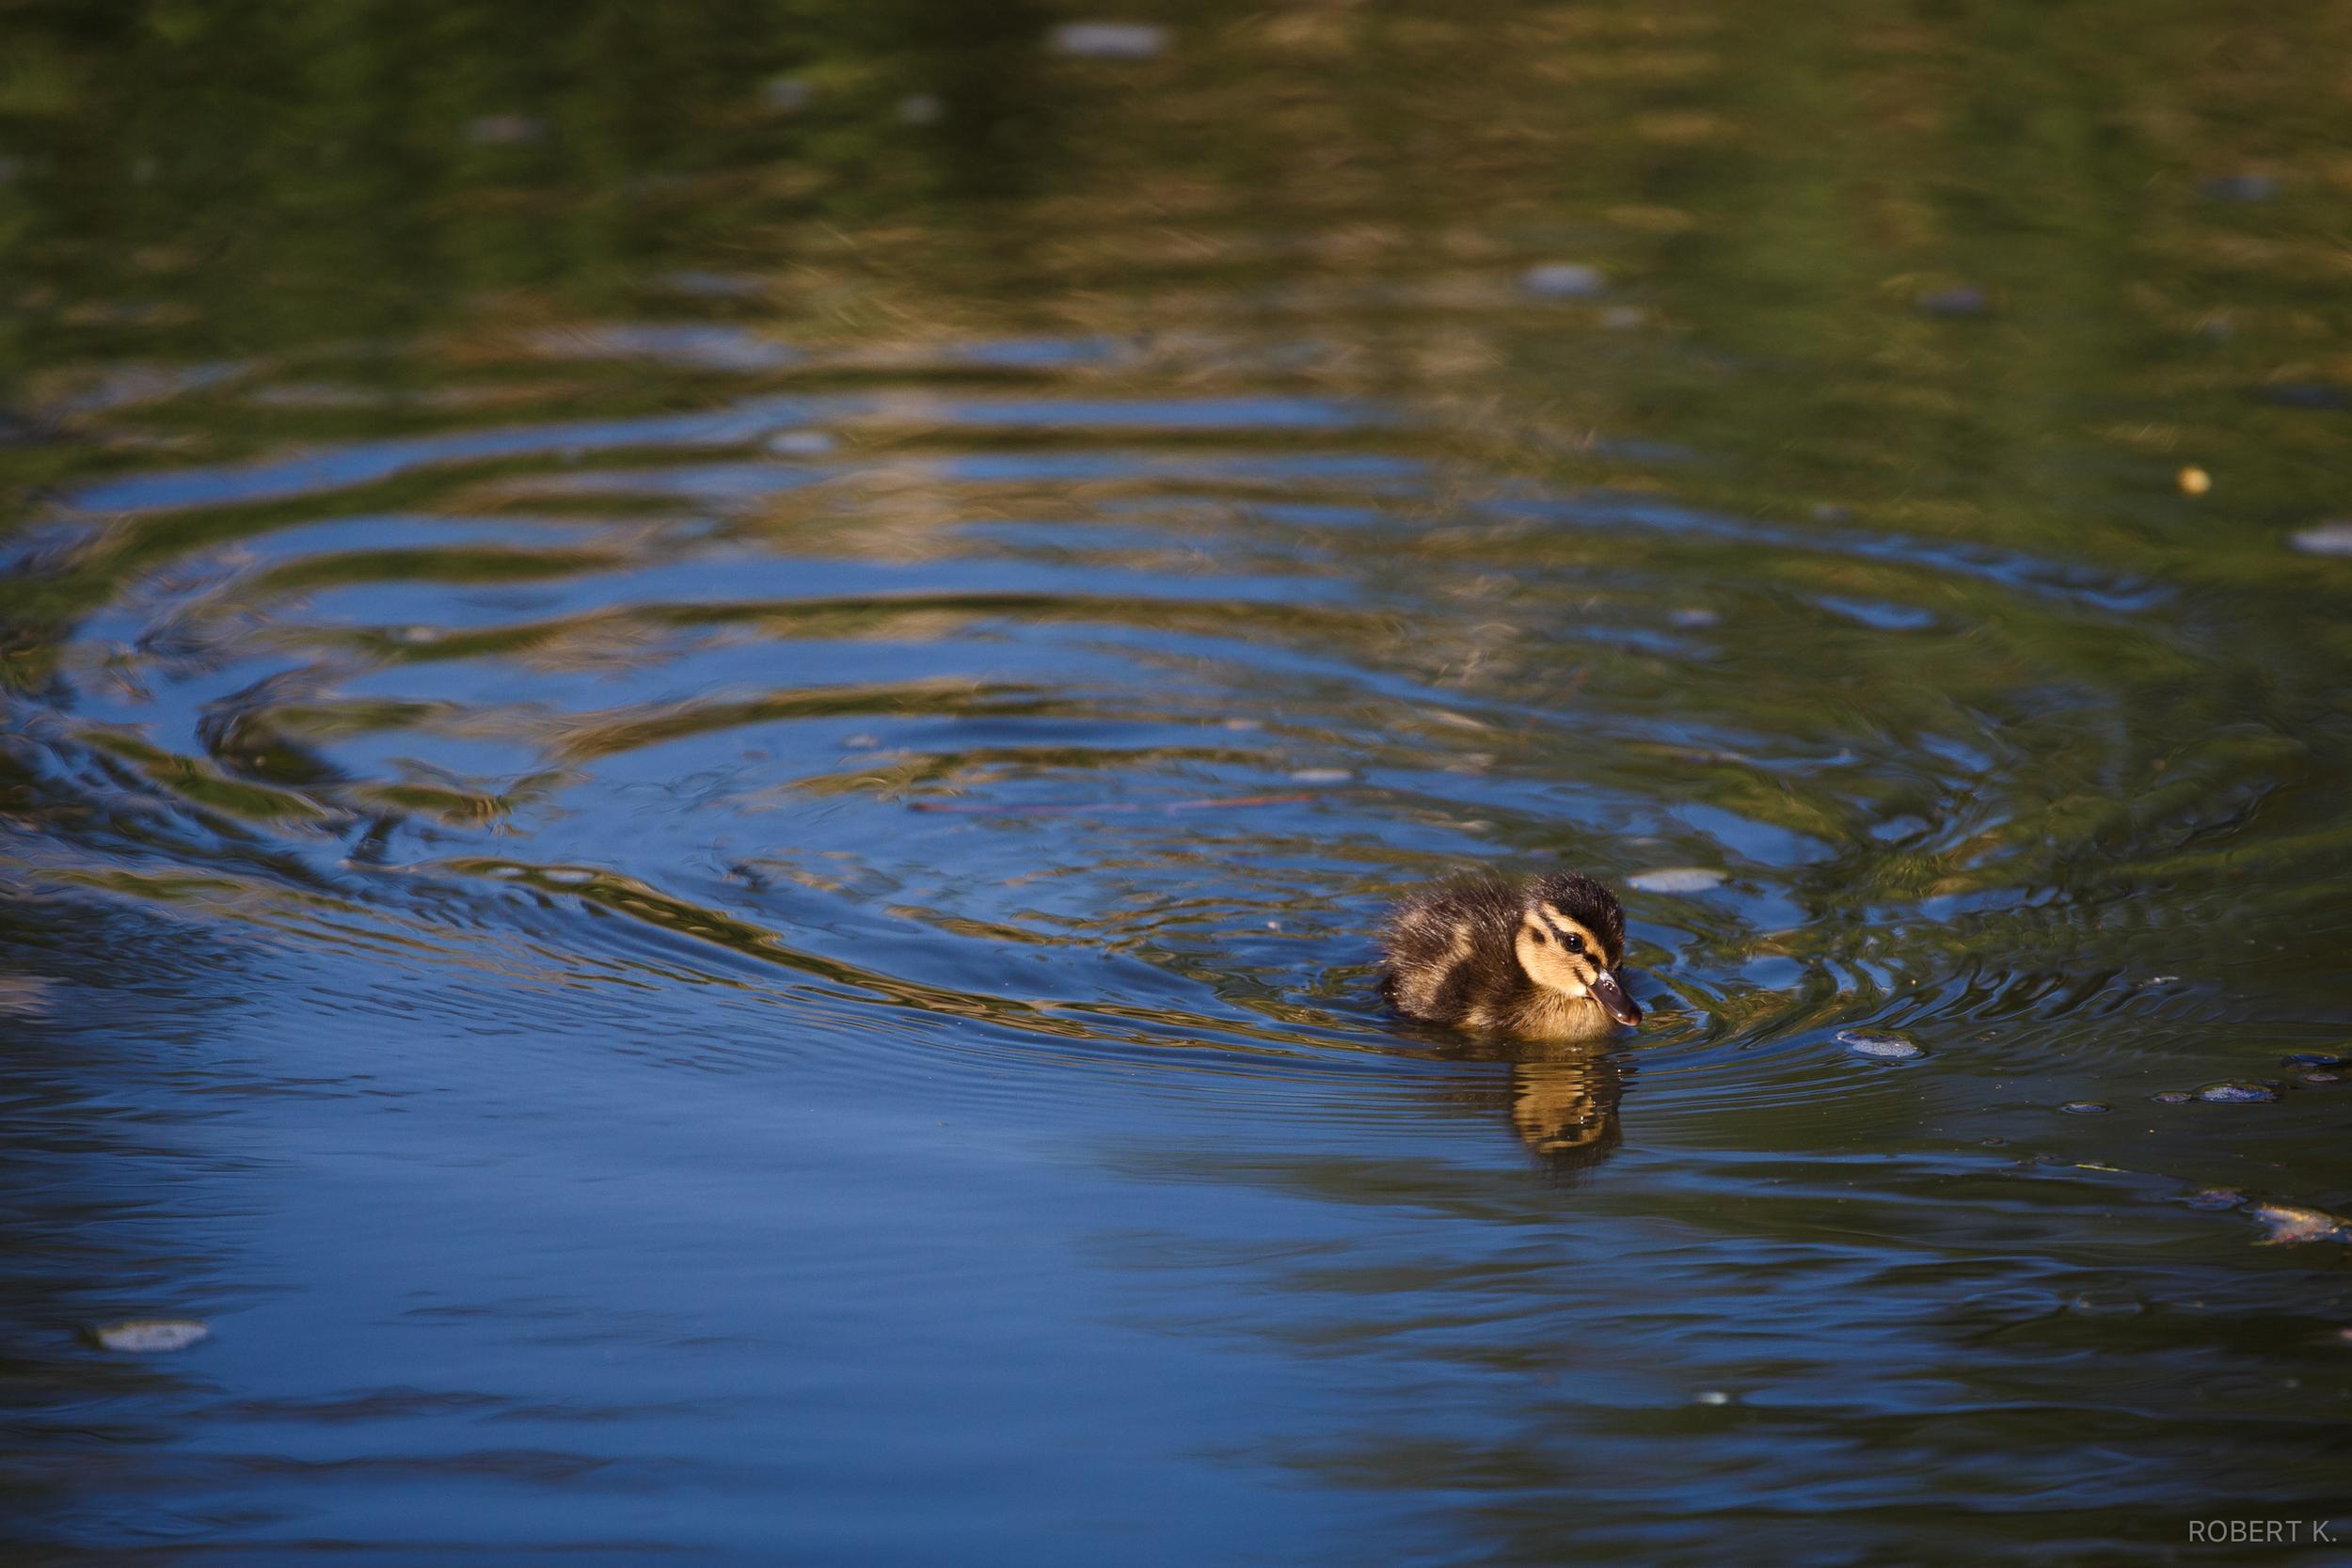 Tiny Duckling. Canon 6D  ,300mm, ƒ/6.3, 1/1250s, ISO 320